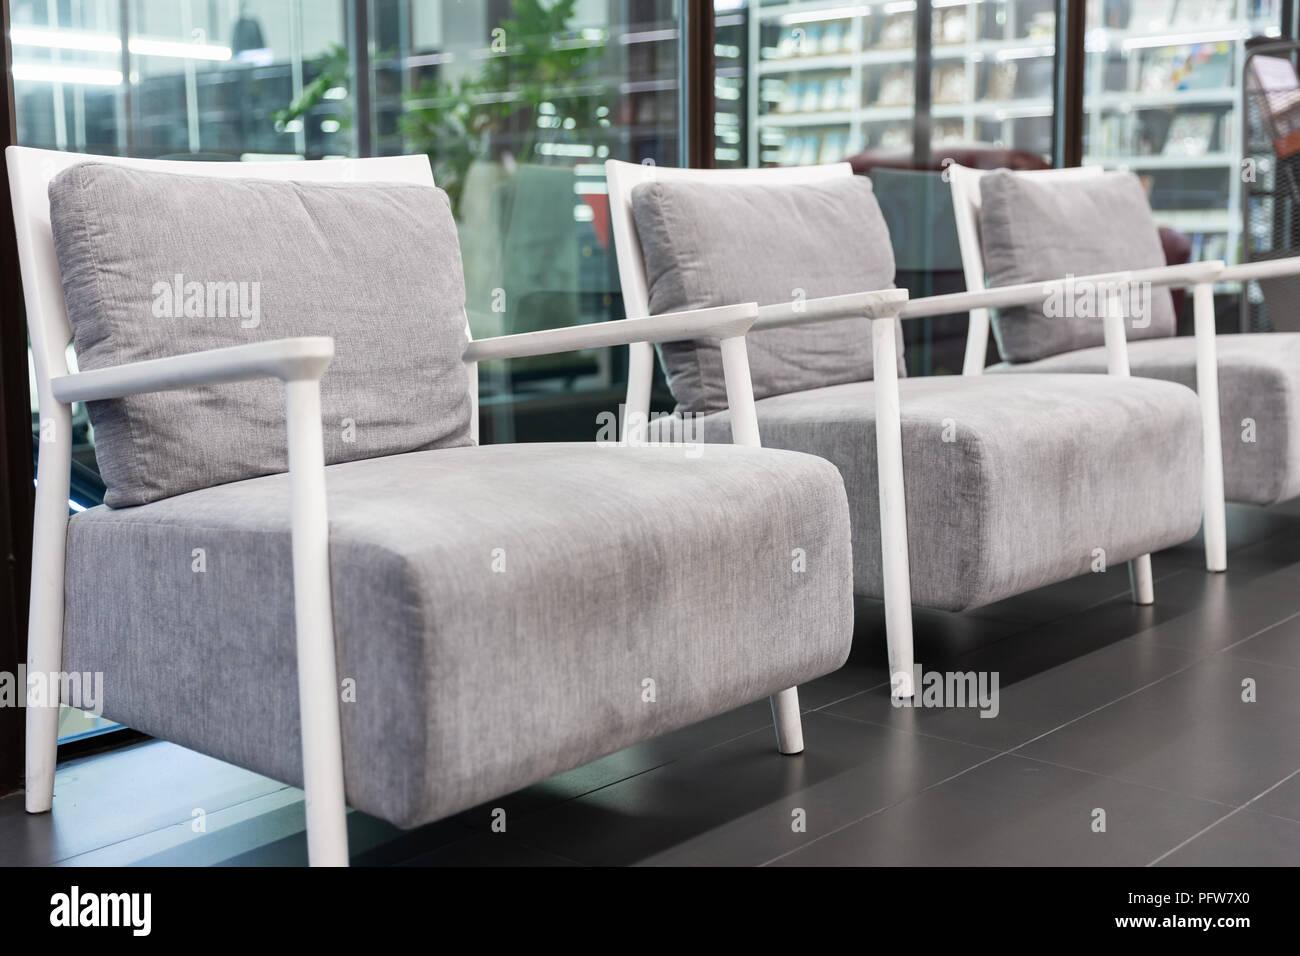 3e84be828 Cerca se centran en tejido gris modernos sillones con estructura blanca de  madera dispuestos cerca de